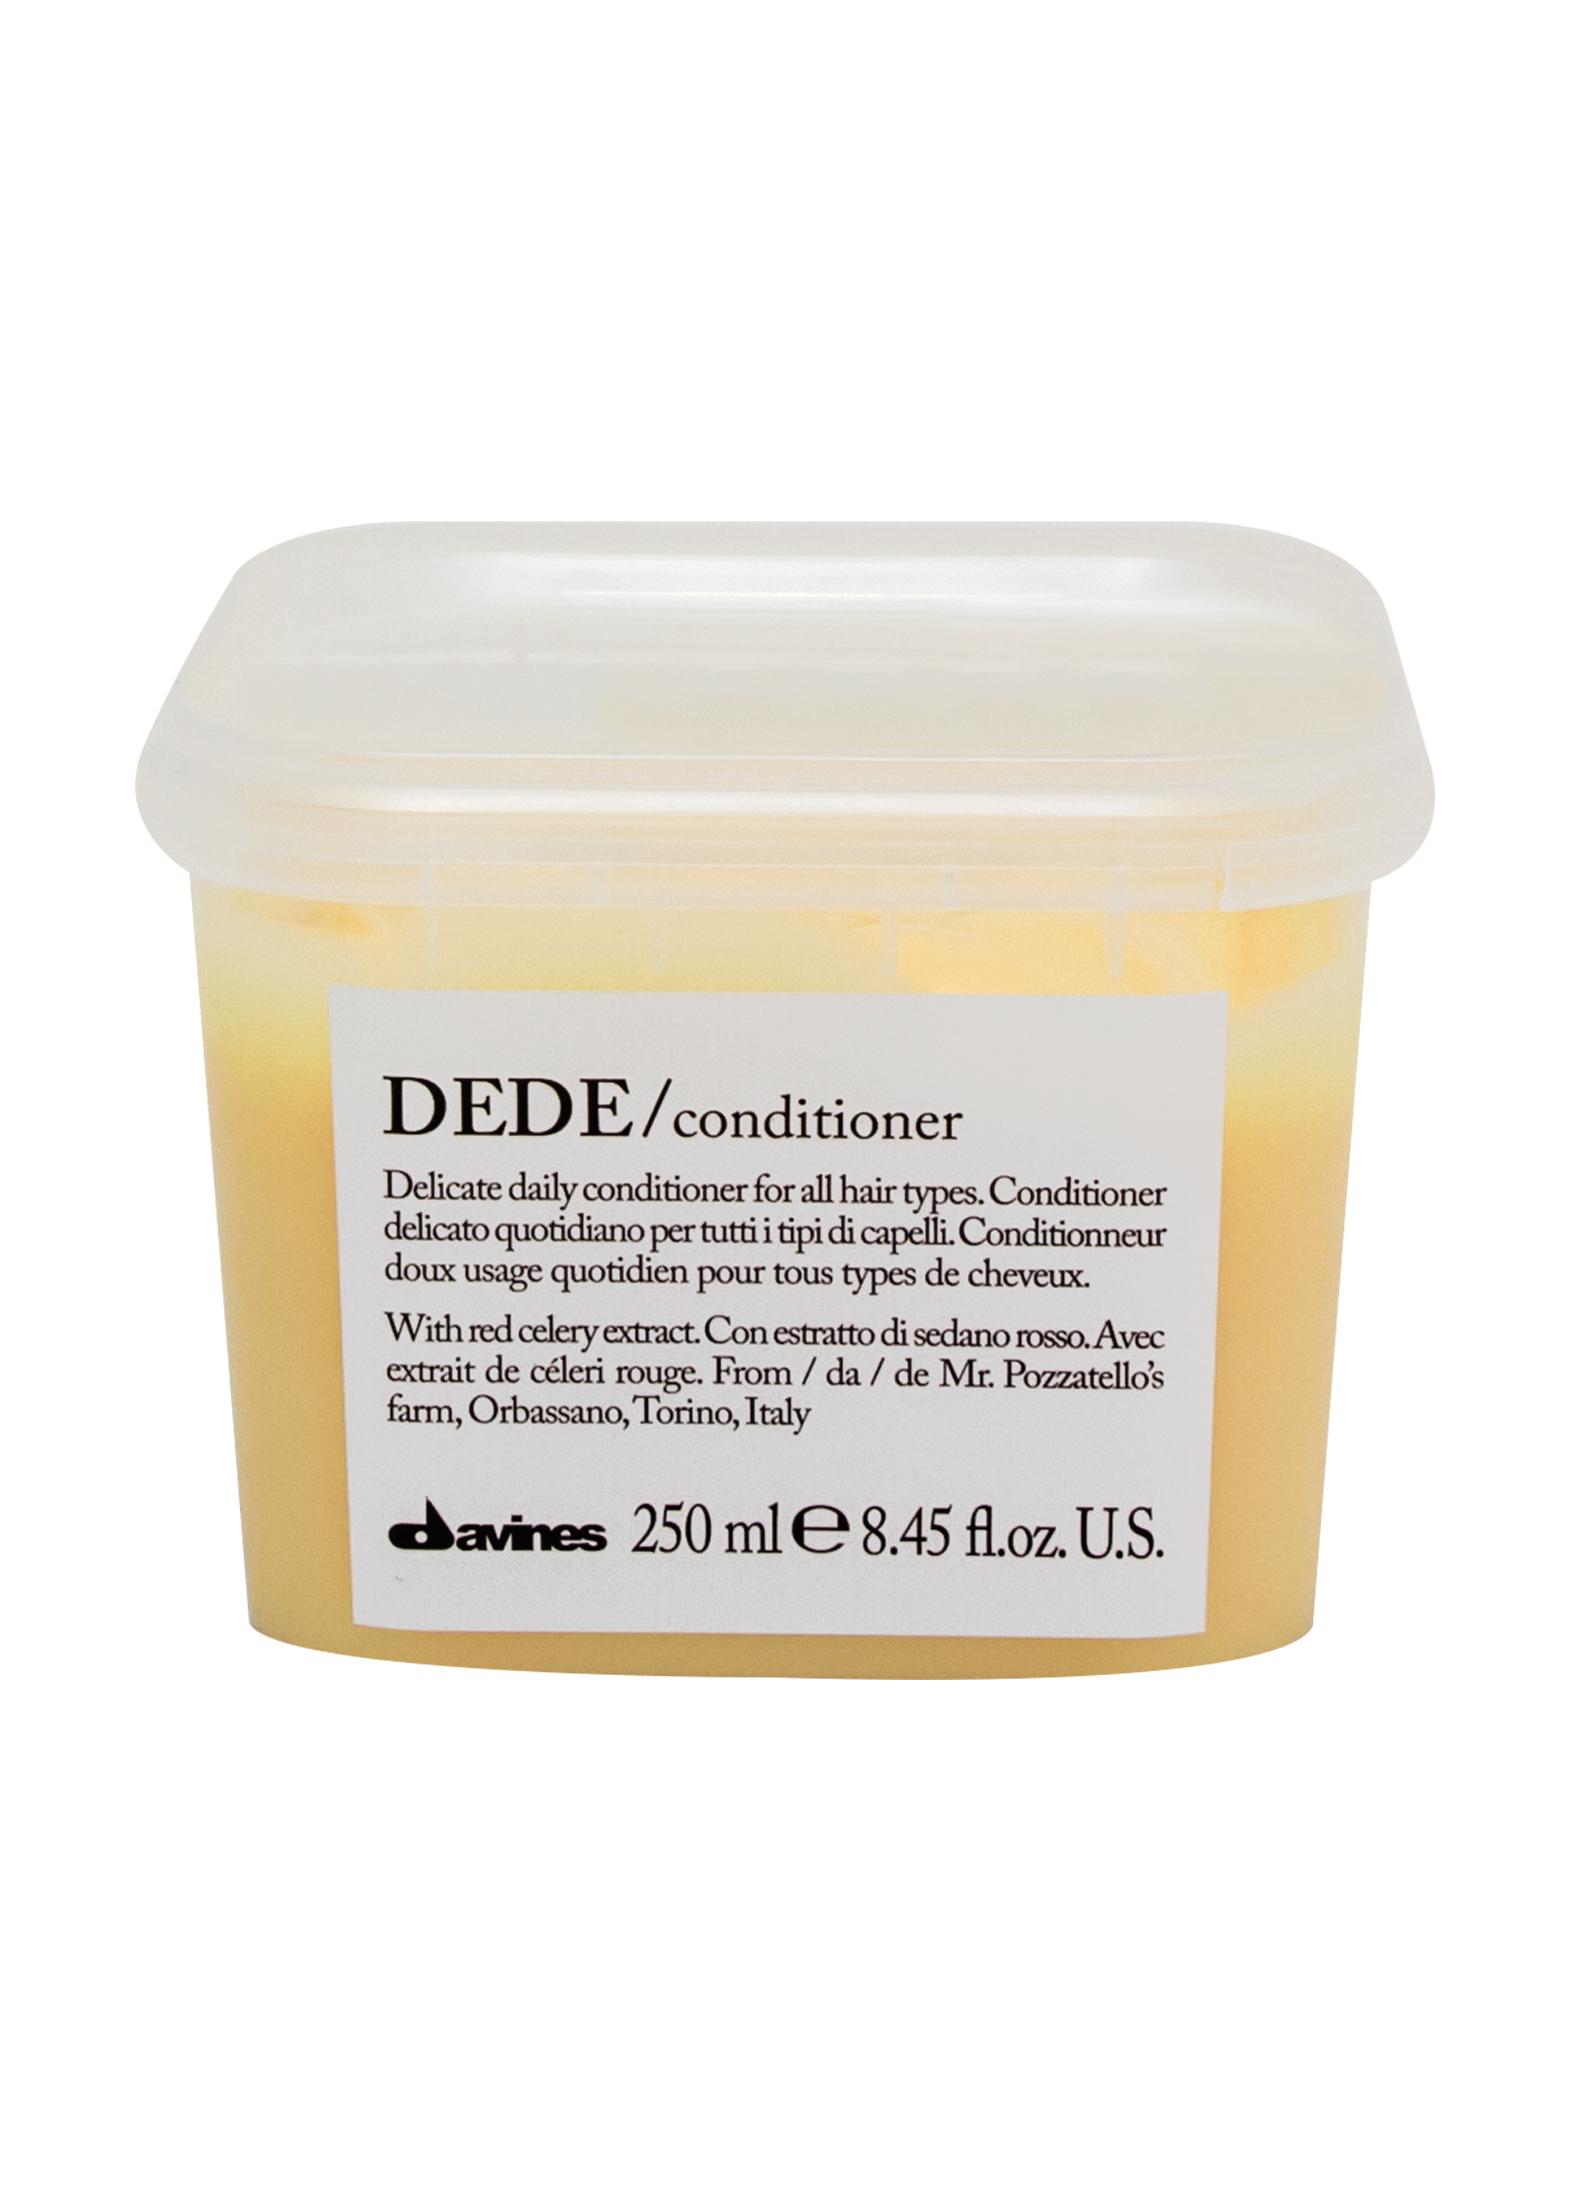 DEHC DEDE Conditioner 250ml image number 0